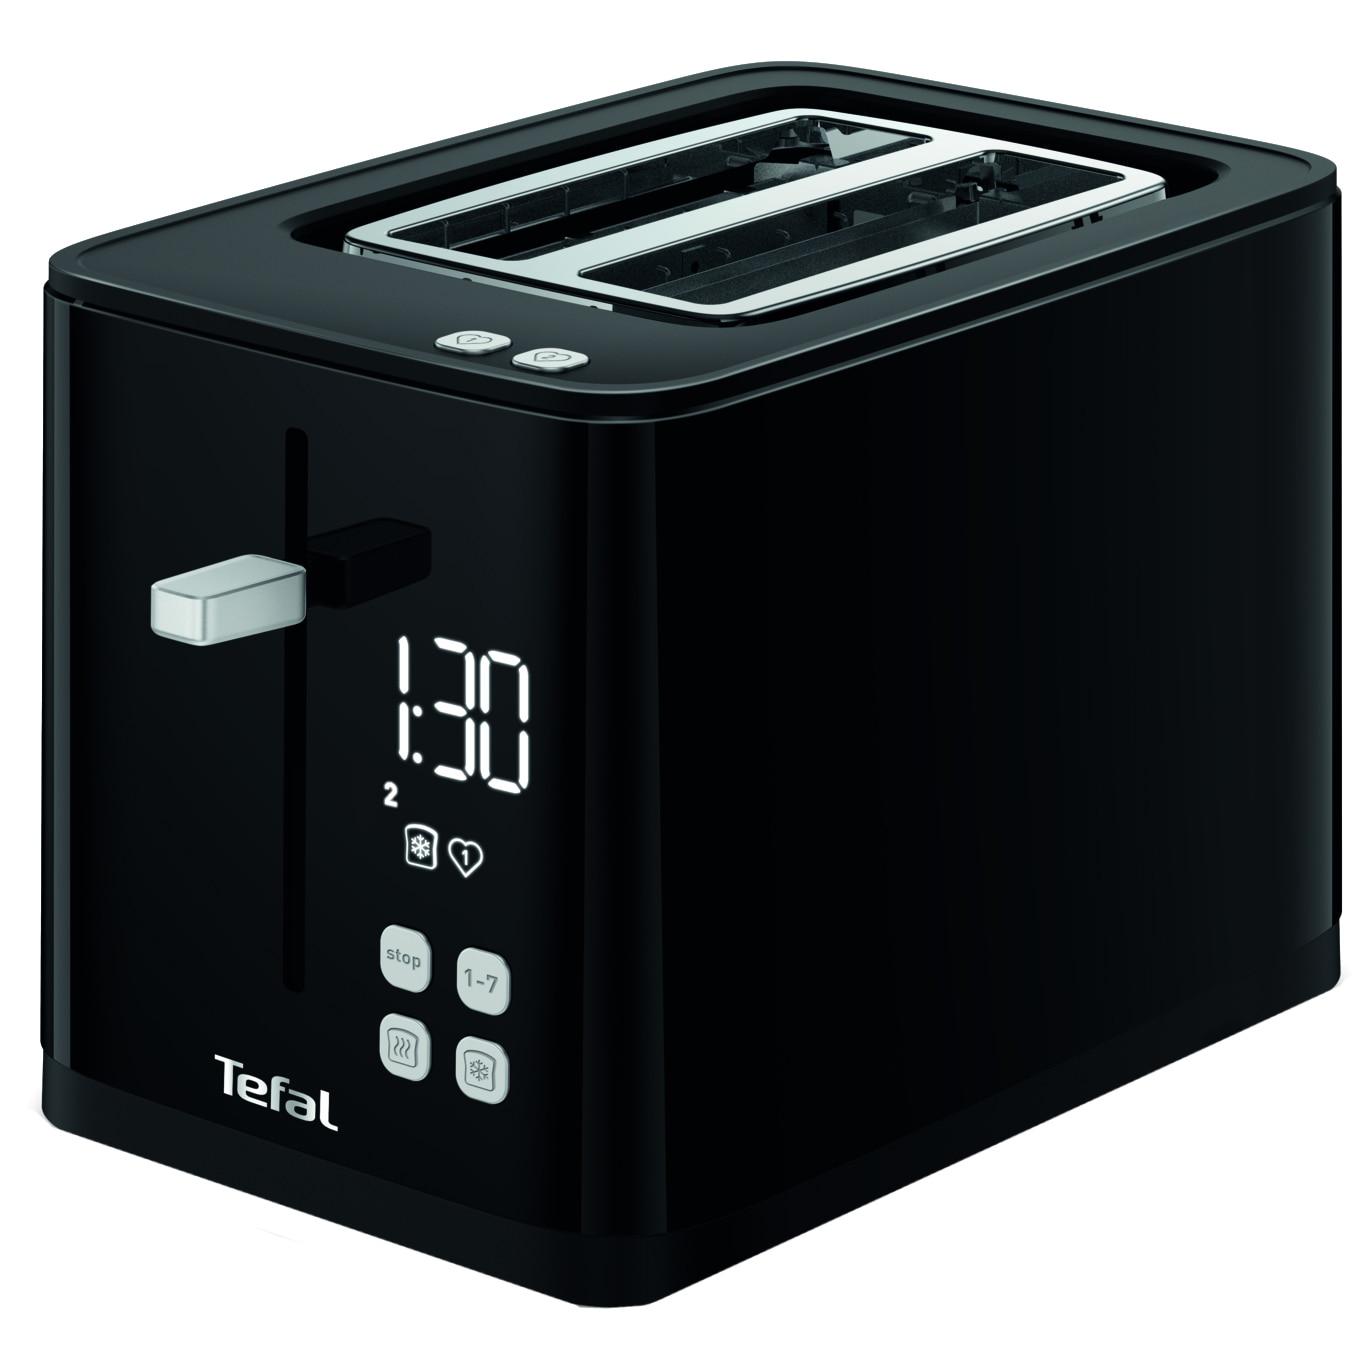 Fotografie Prajitor de paine TEFAL Smart'n Light TT640810, 850W, ecran digital, 3 functii dedicate, 7 niveluri de rumenire, Negru